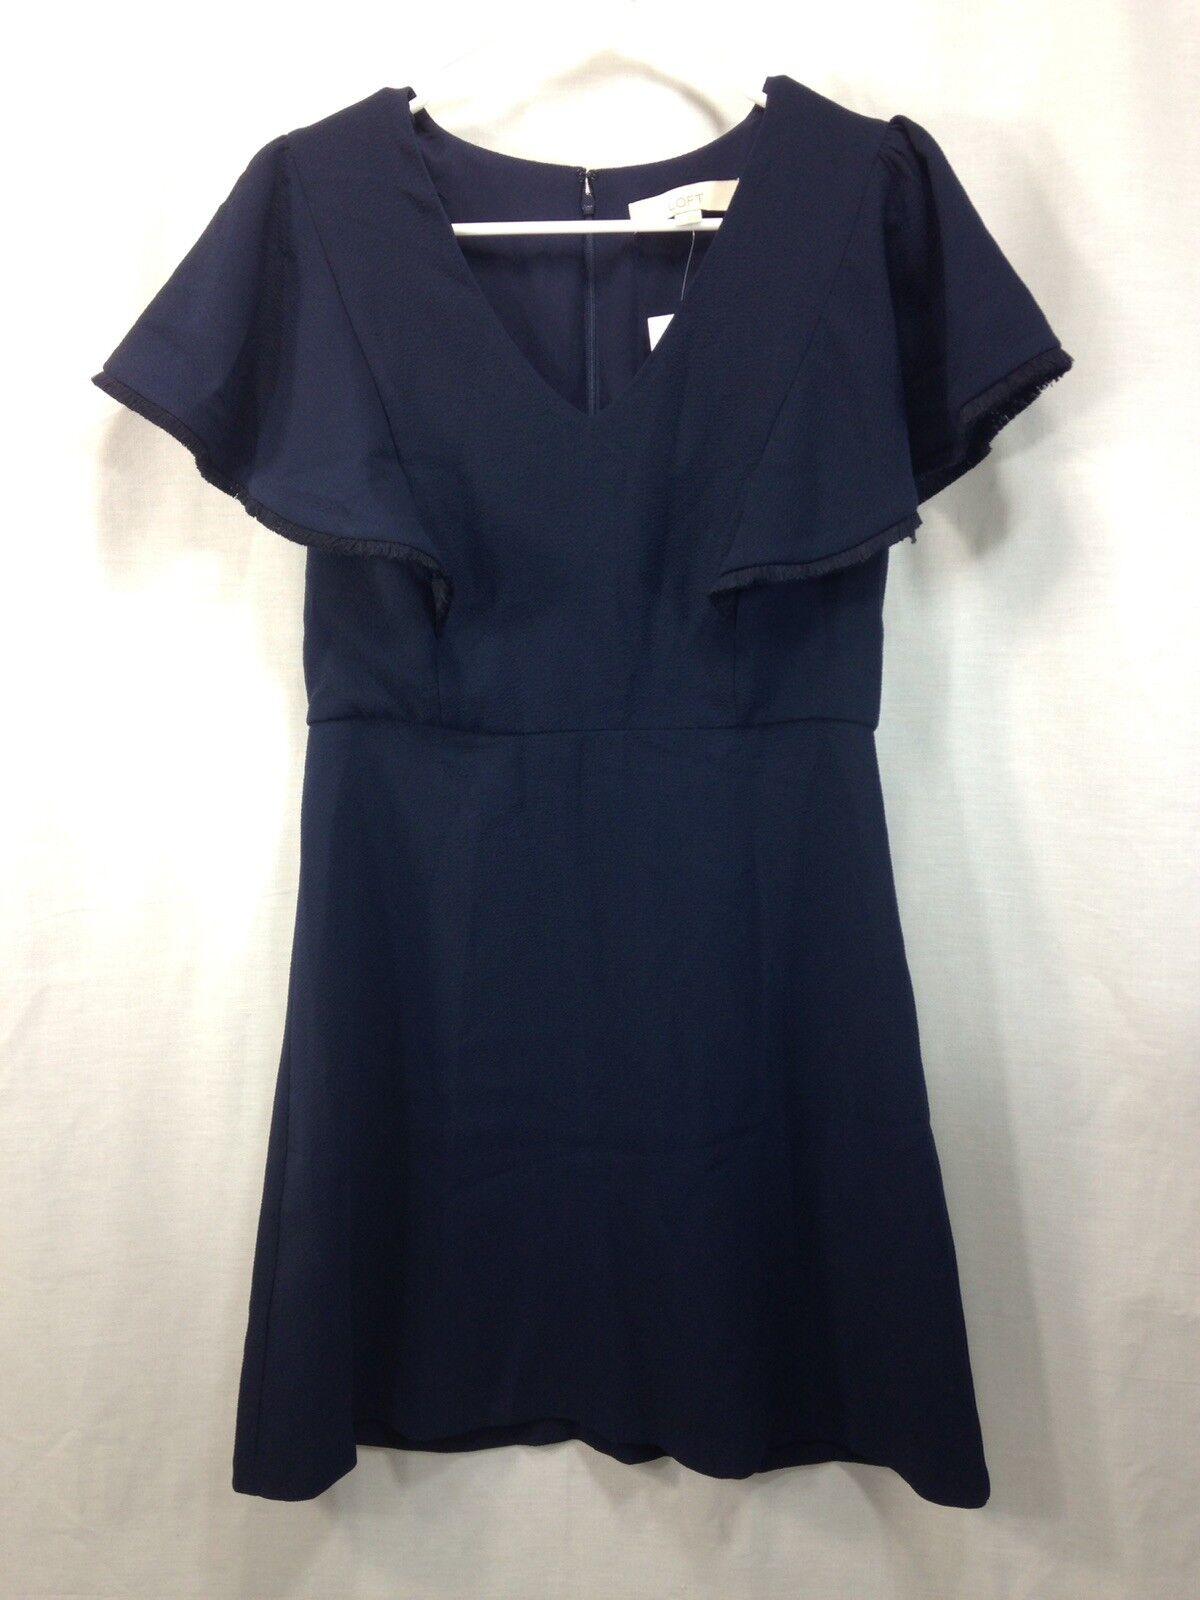 NEW Loft Dress damen Navy Blau Cocktail Formal Short Ruffle Sleeve Poly Spandex